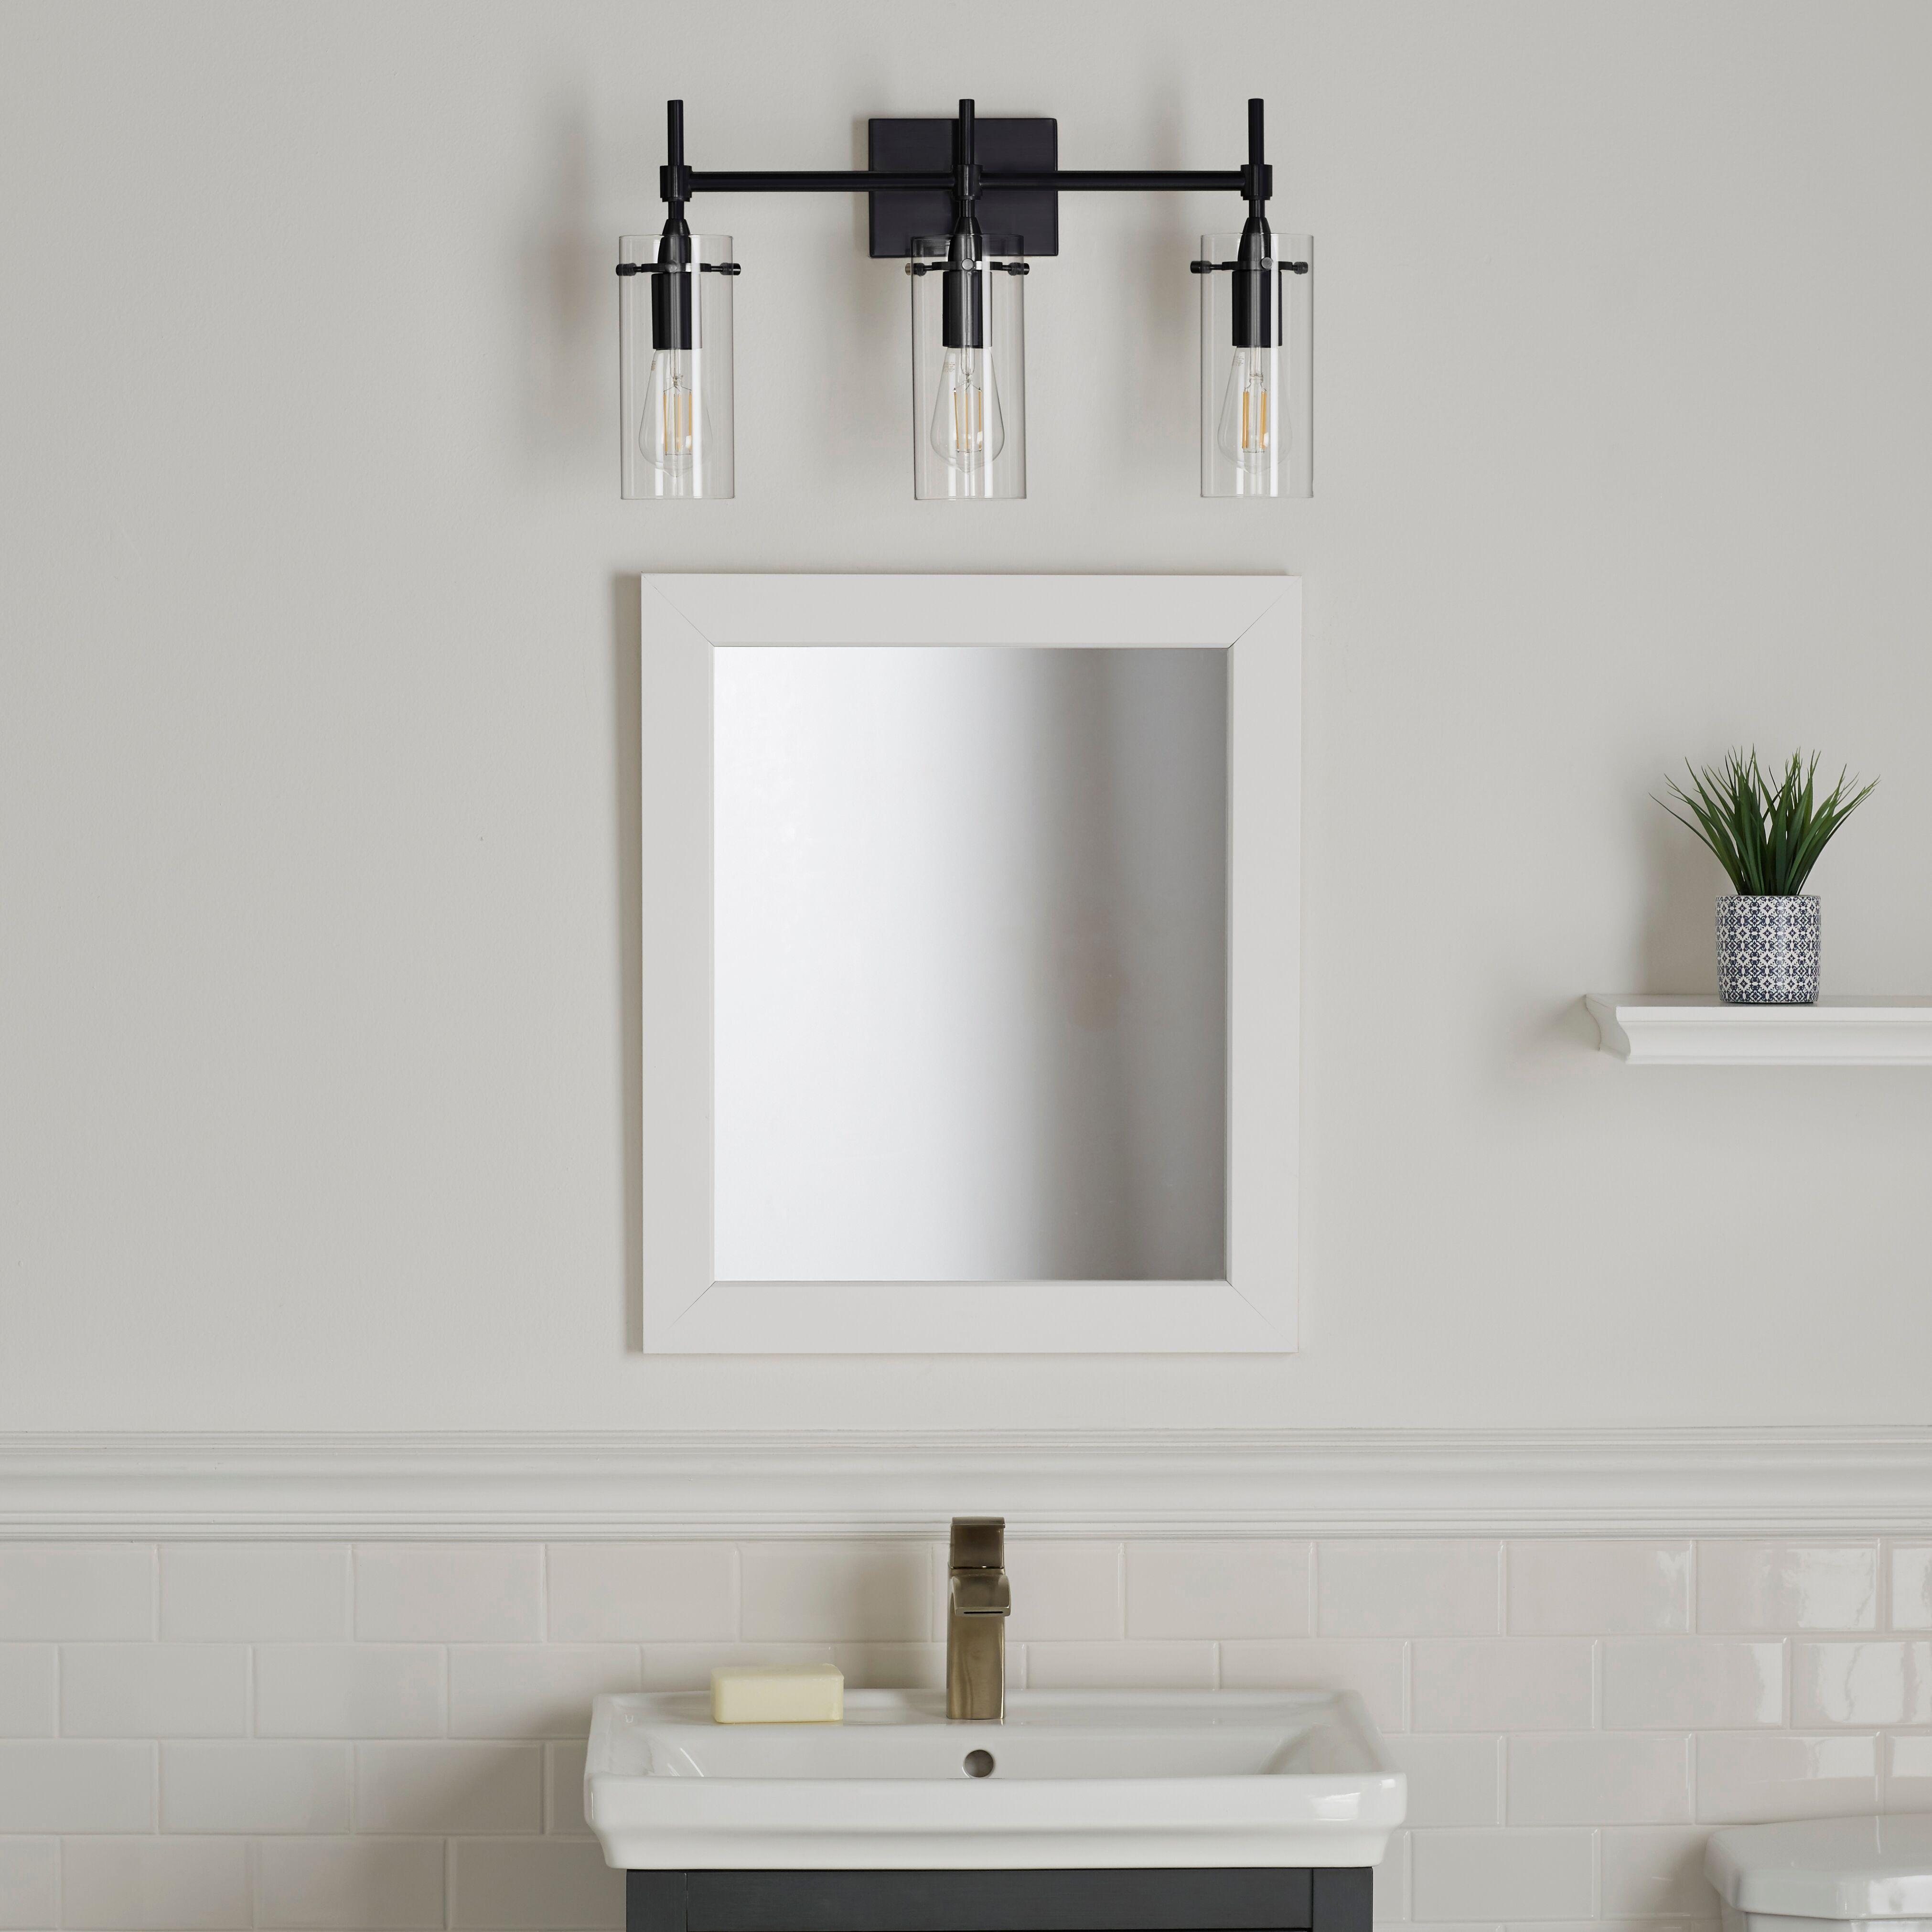 Farmhouse inspired, the Effimero three light bathroom